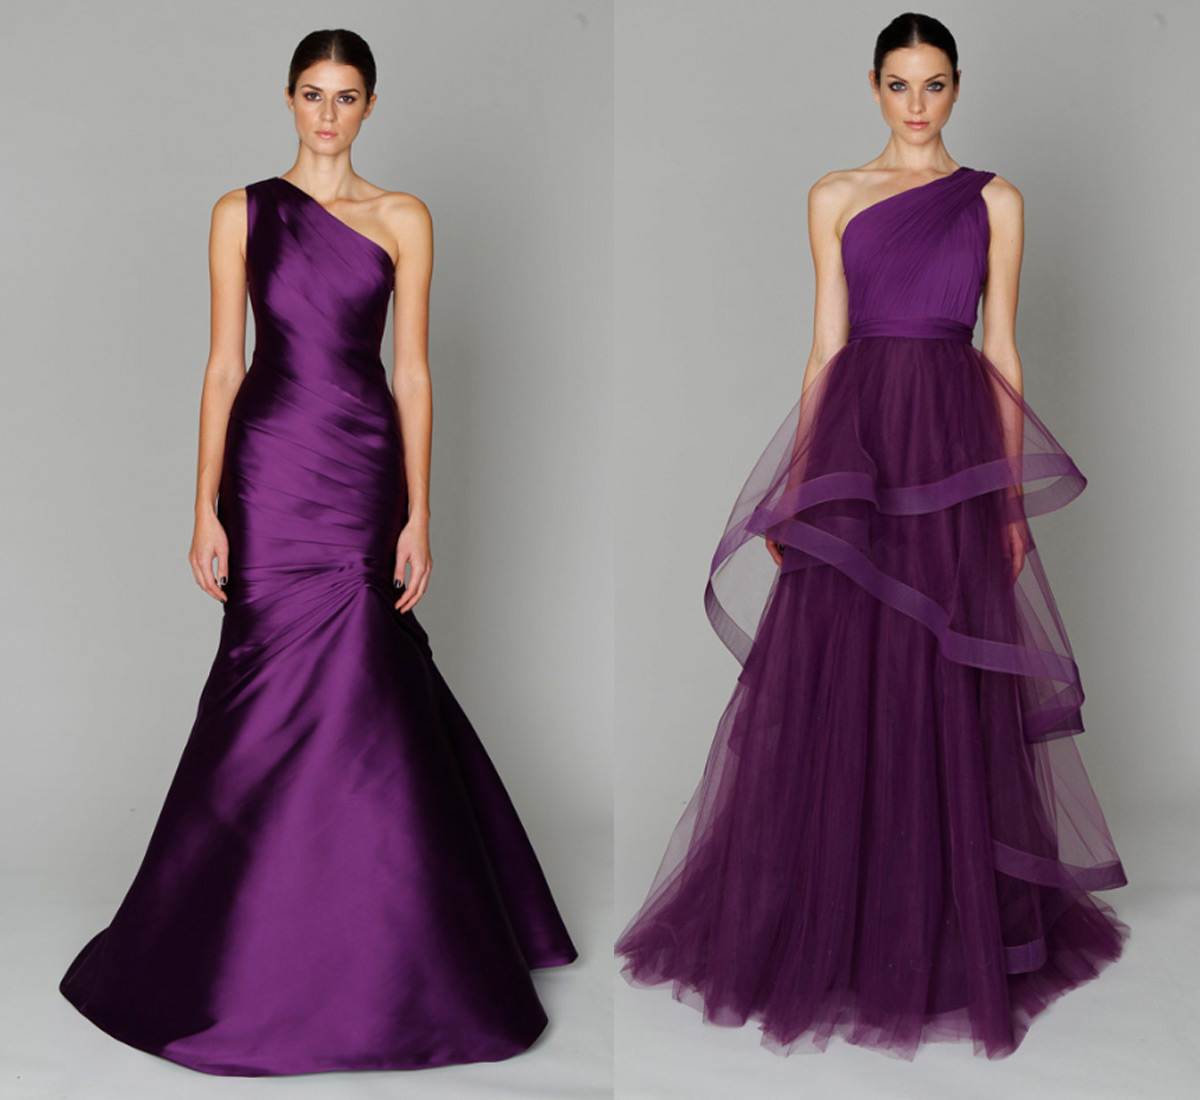 purple evening dresses photo - 1